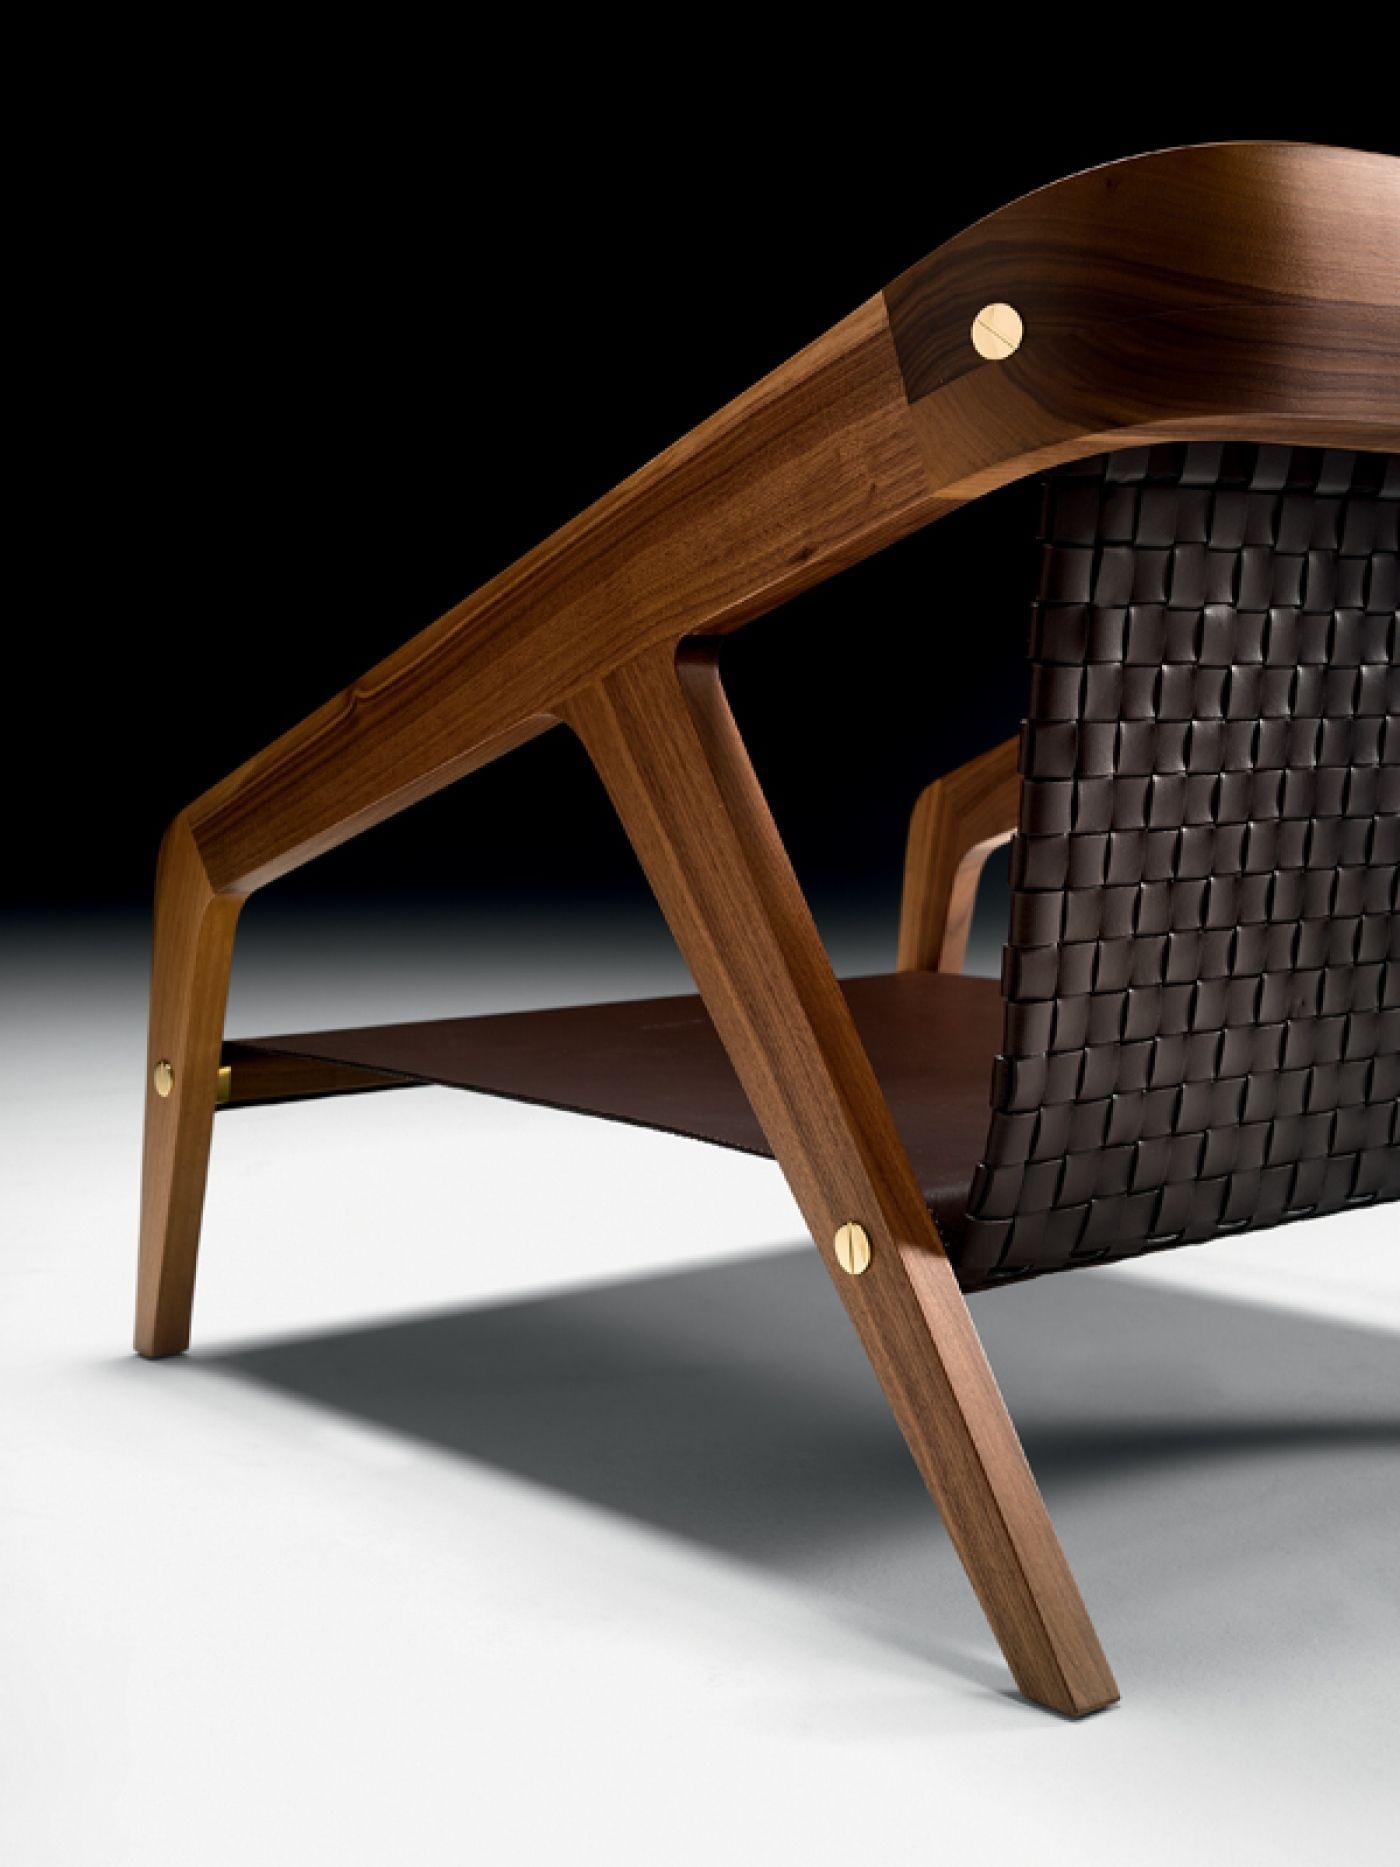 Black Tie Frisè Armchair, Furniture, Armchair design